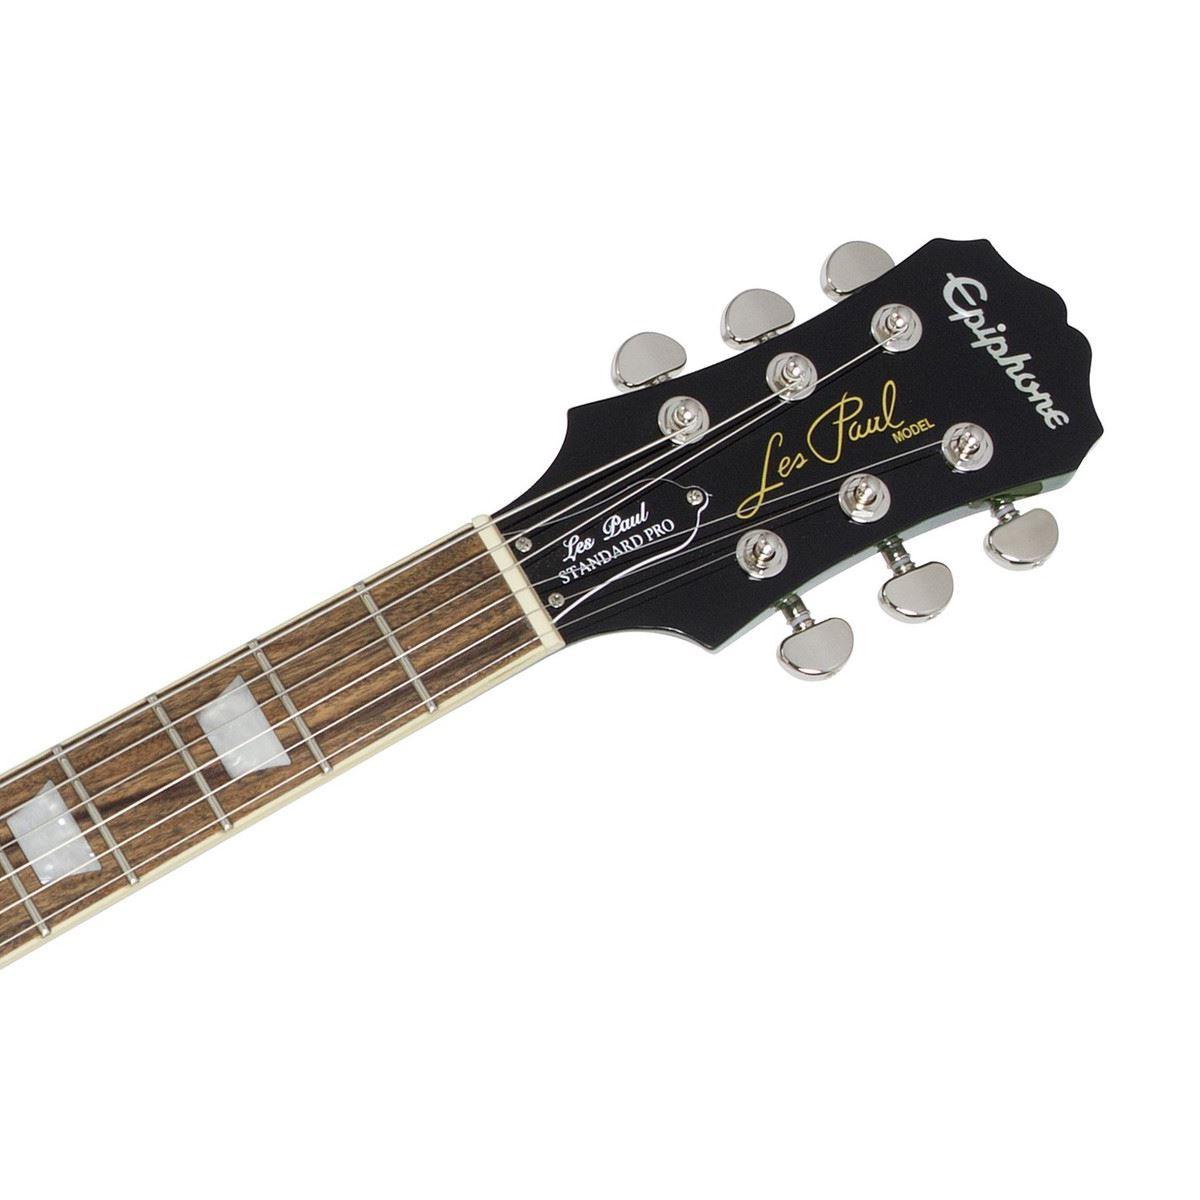 Epiphone Les Paul Standard PlusTop Pro Electric Guitar Green Burst